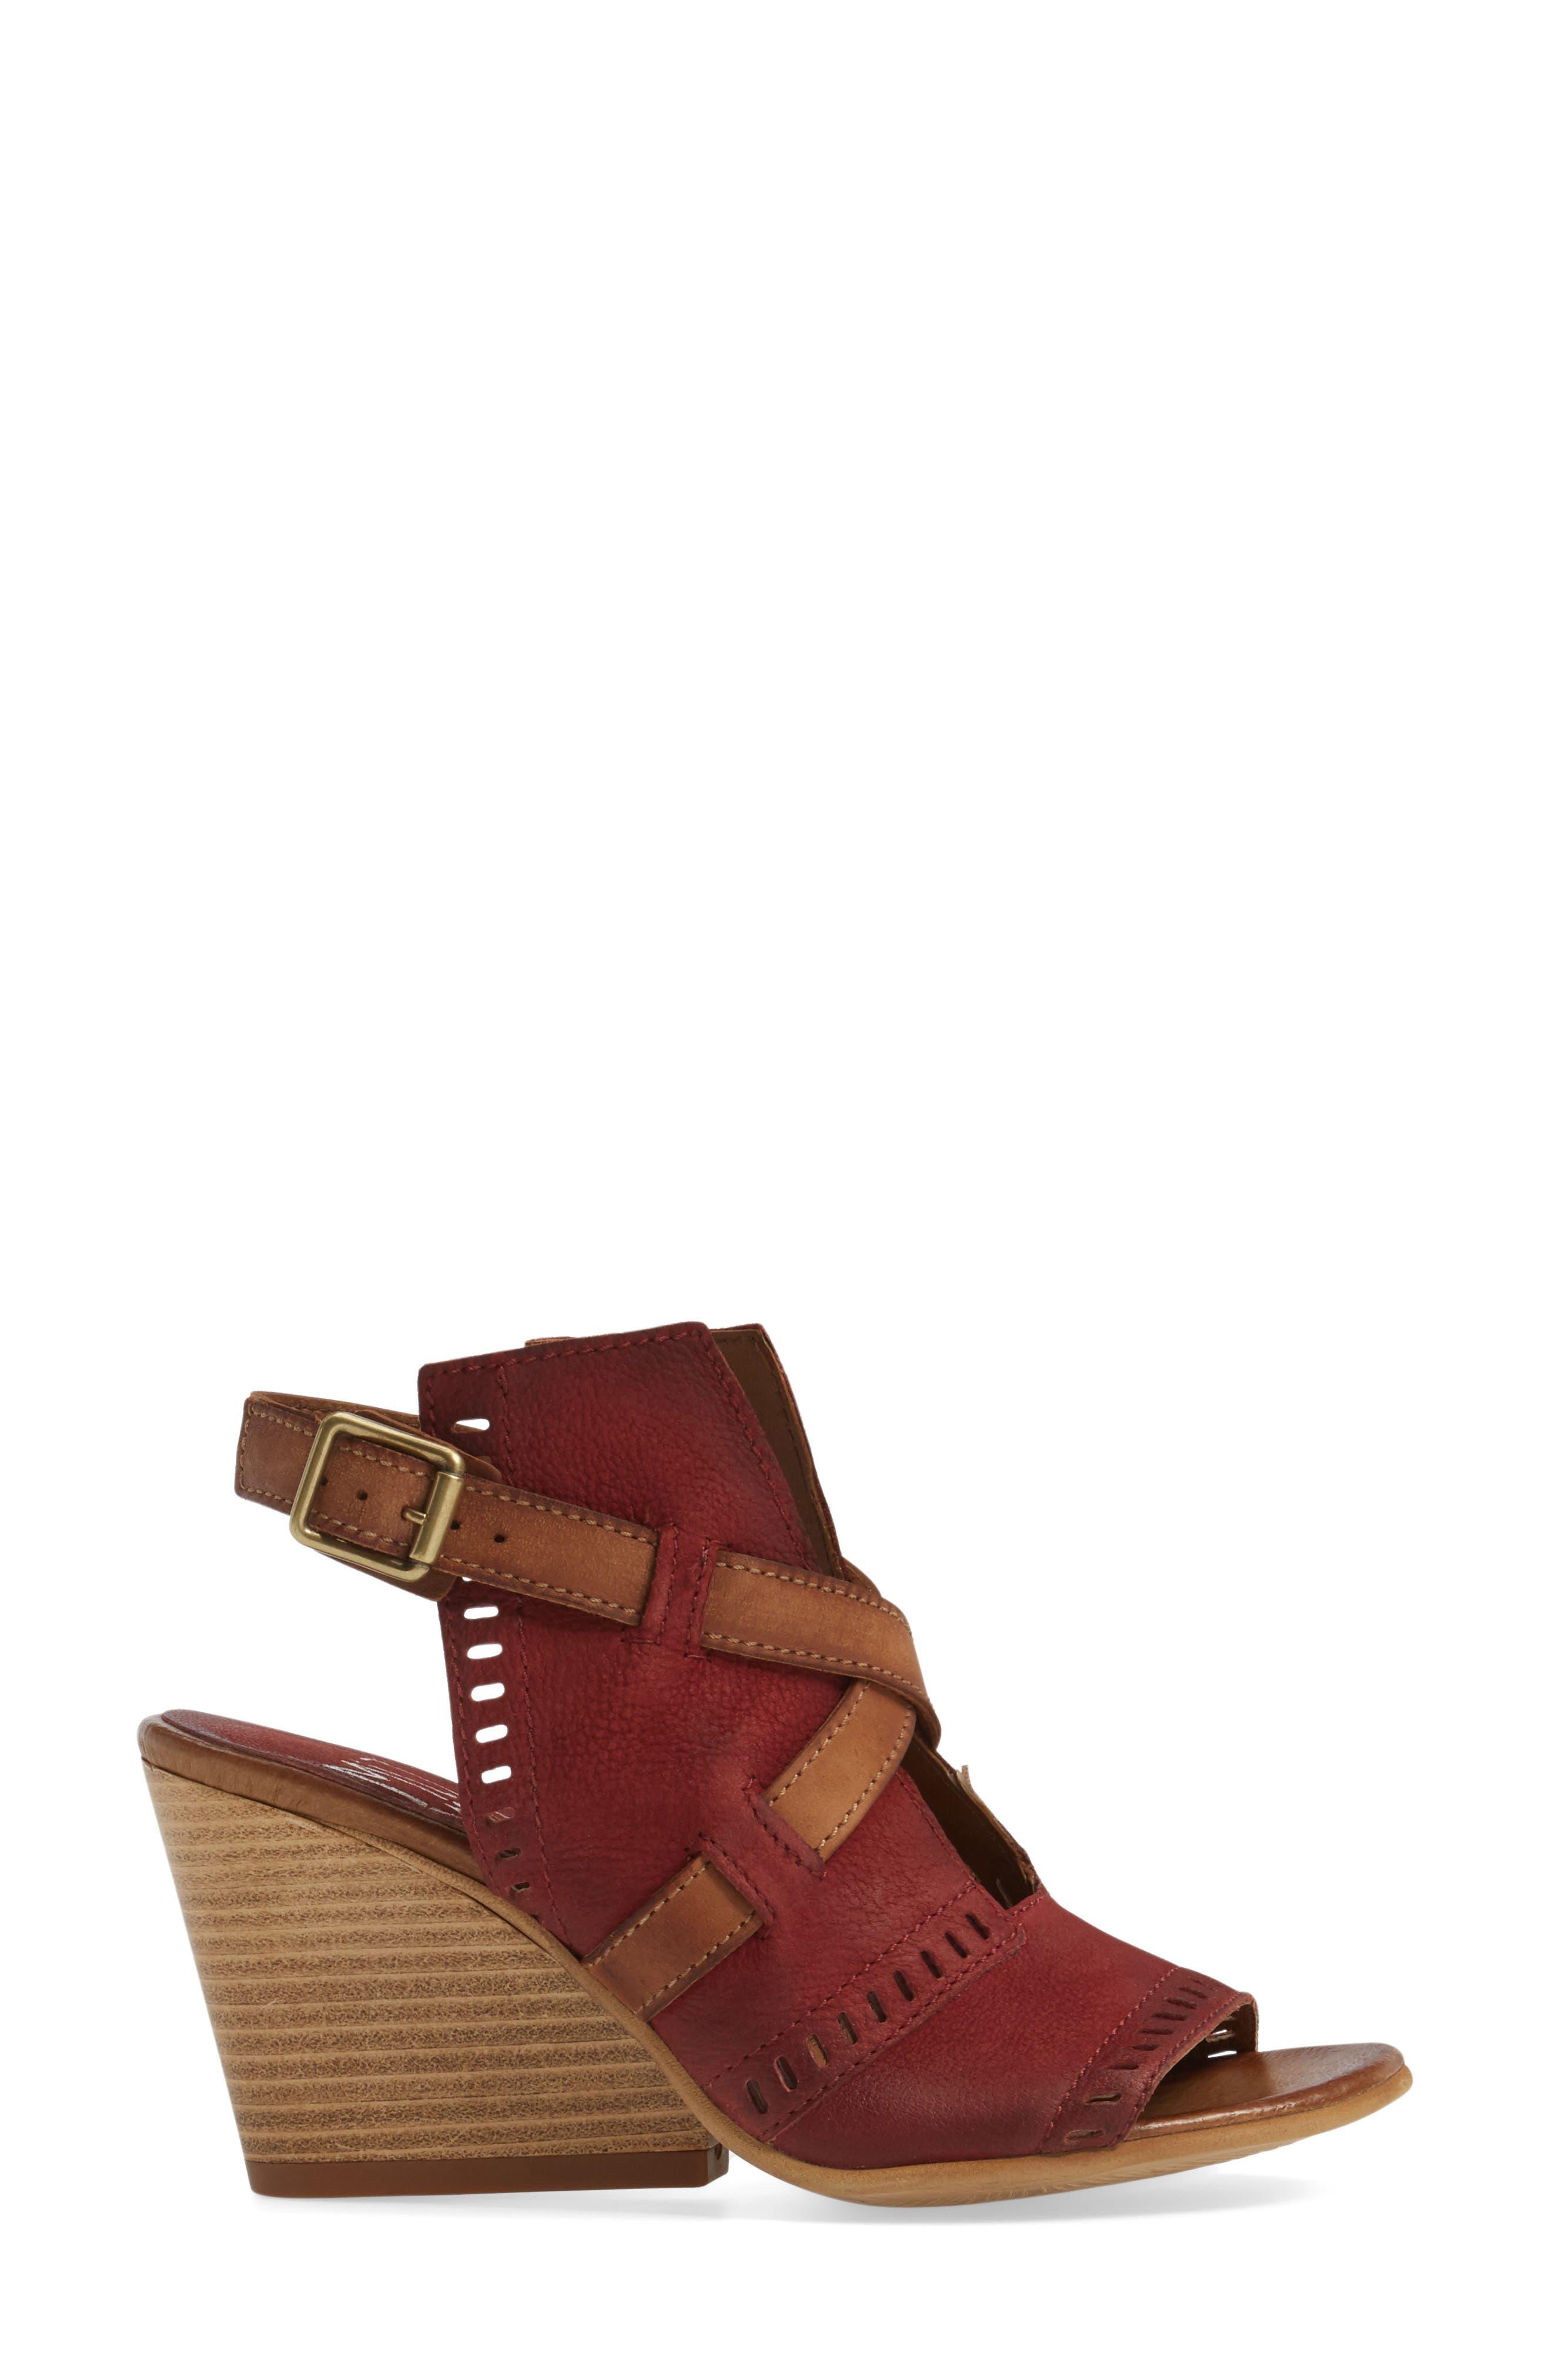 Kipling Perforated Sandal,                             Alternate thumbnail 12, color,